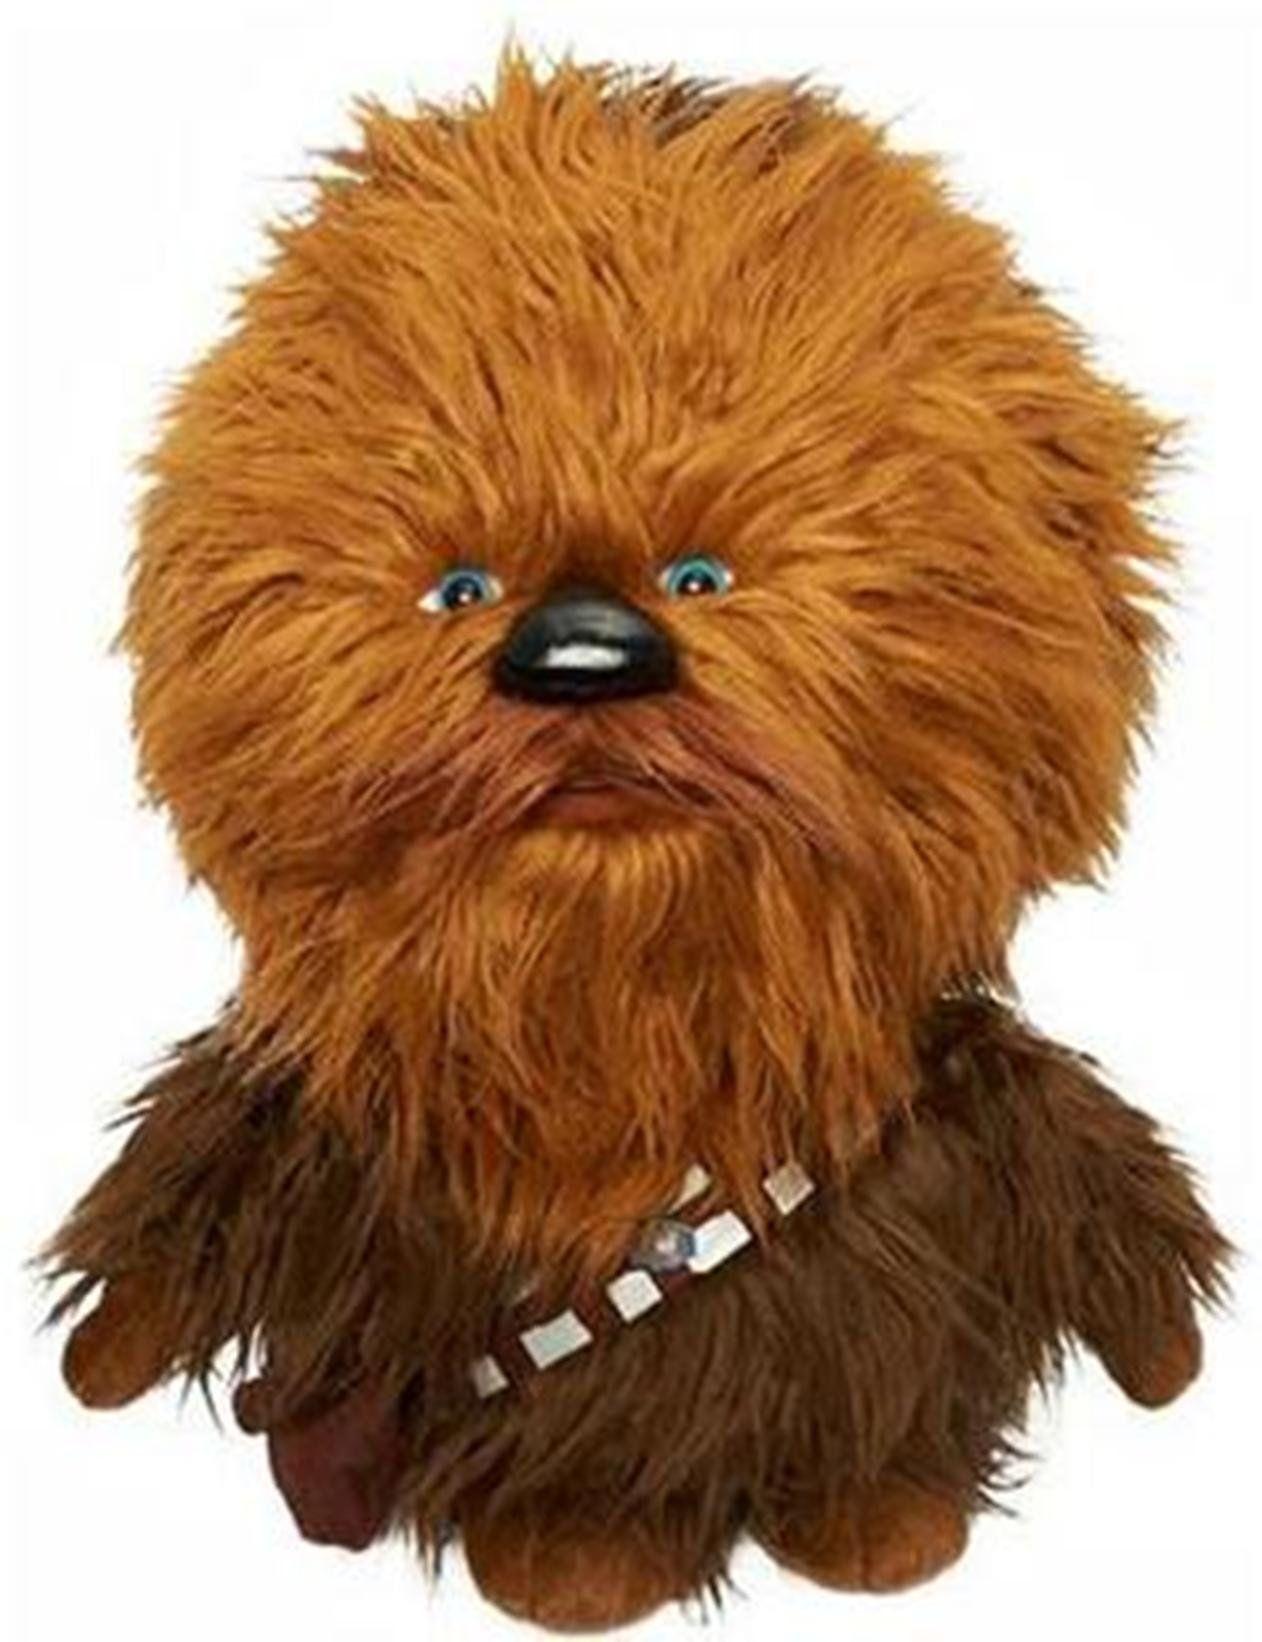 Robot Check Star wars toys, Star wars chewbacca, Chewbacca